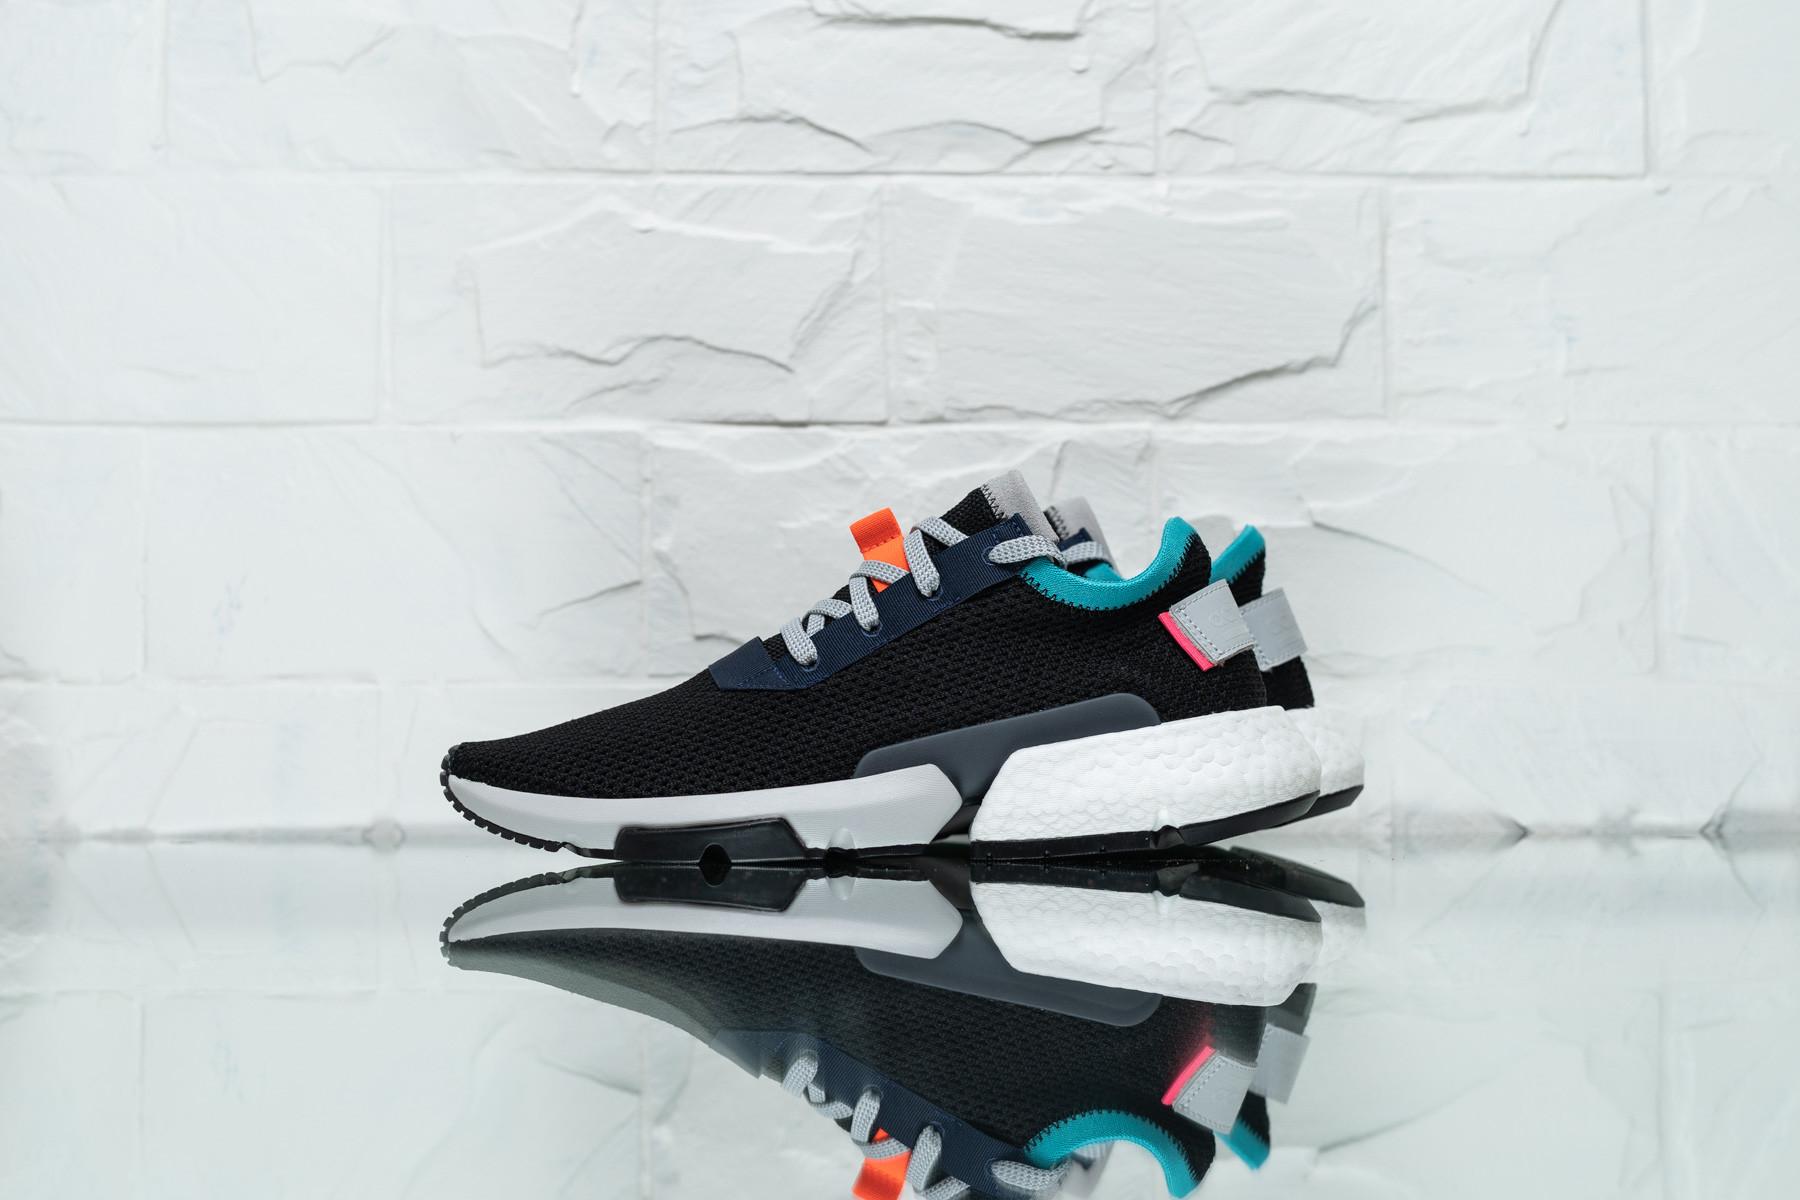 Adidas Pod S3 1 Sneaker No